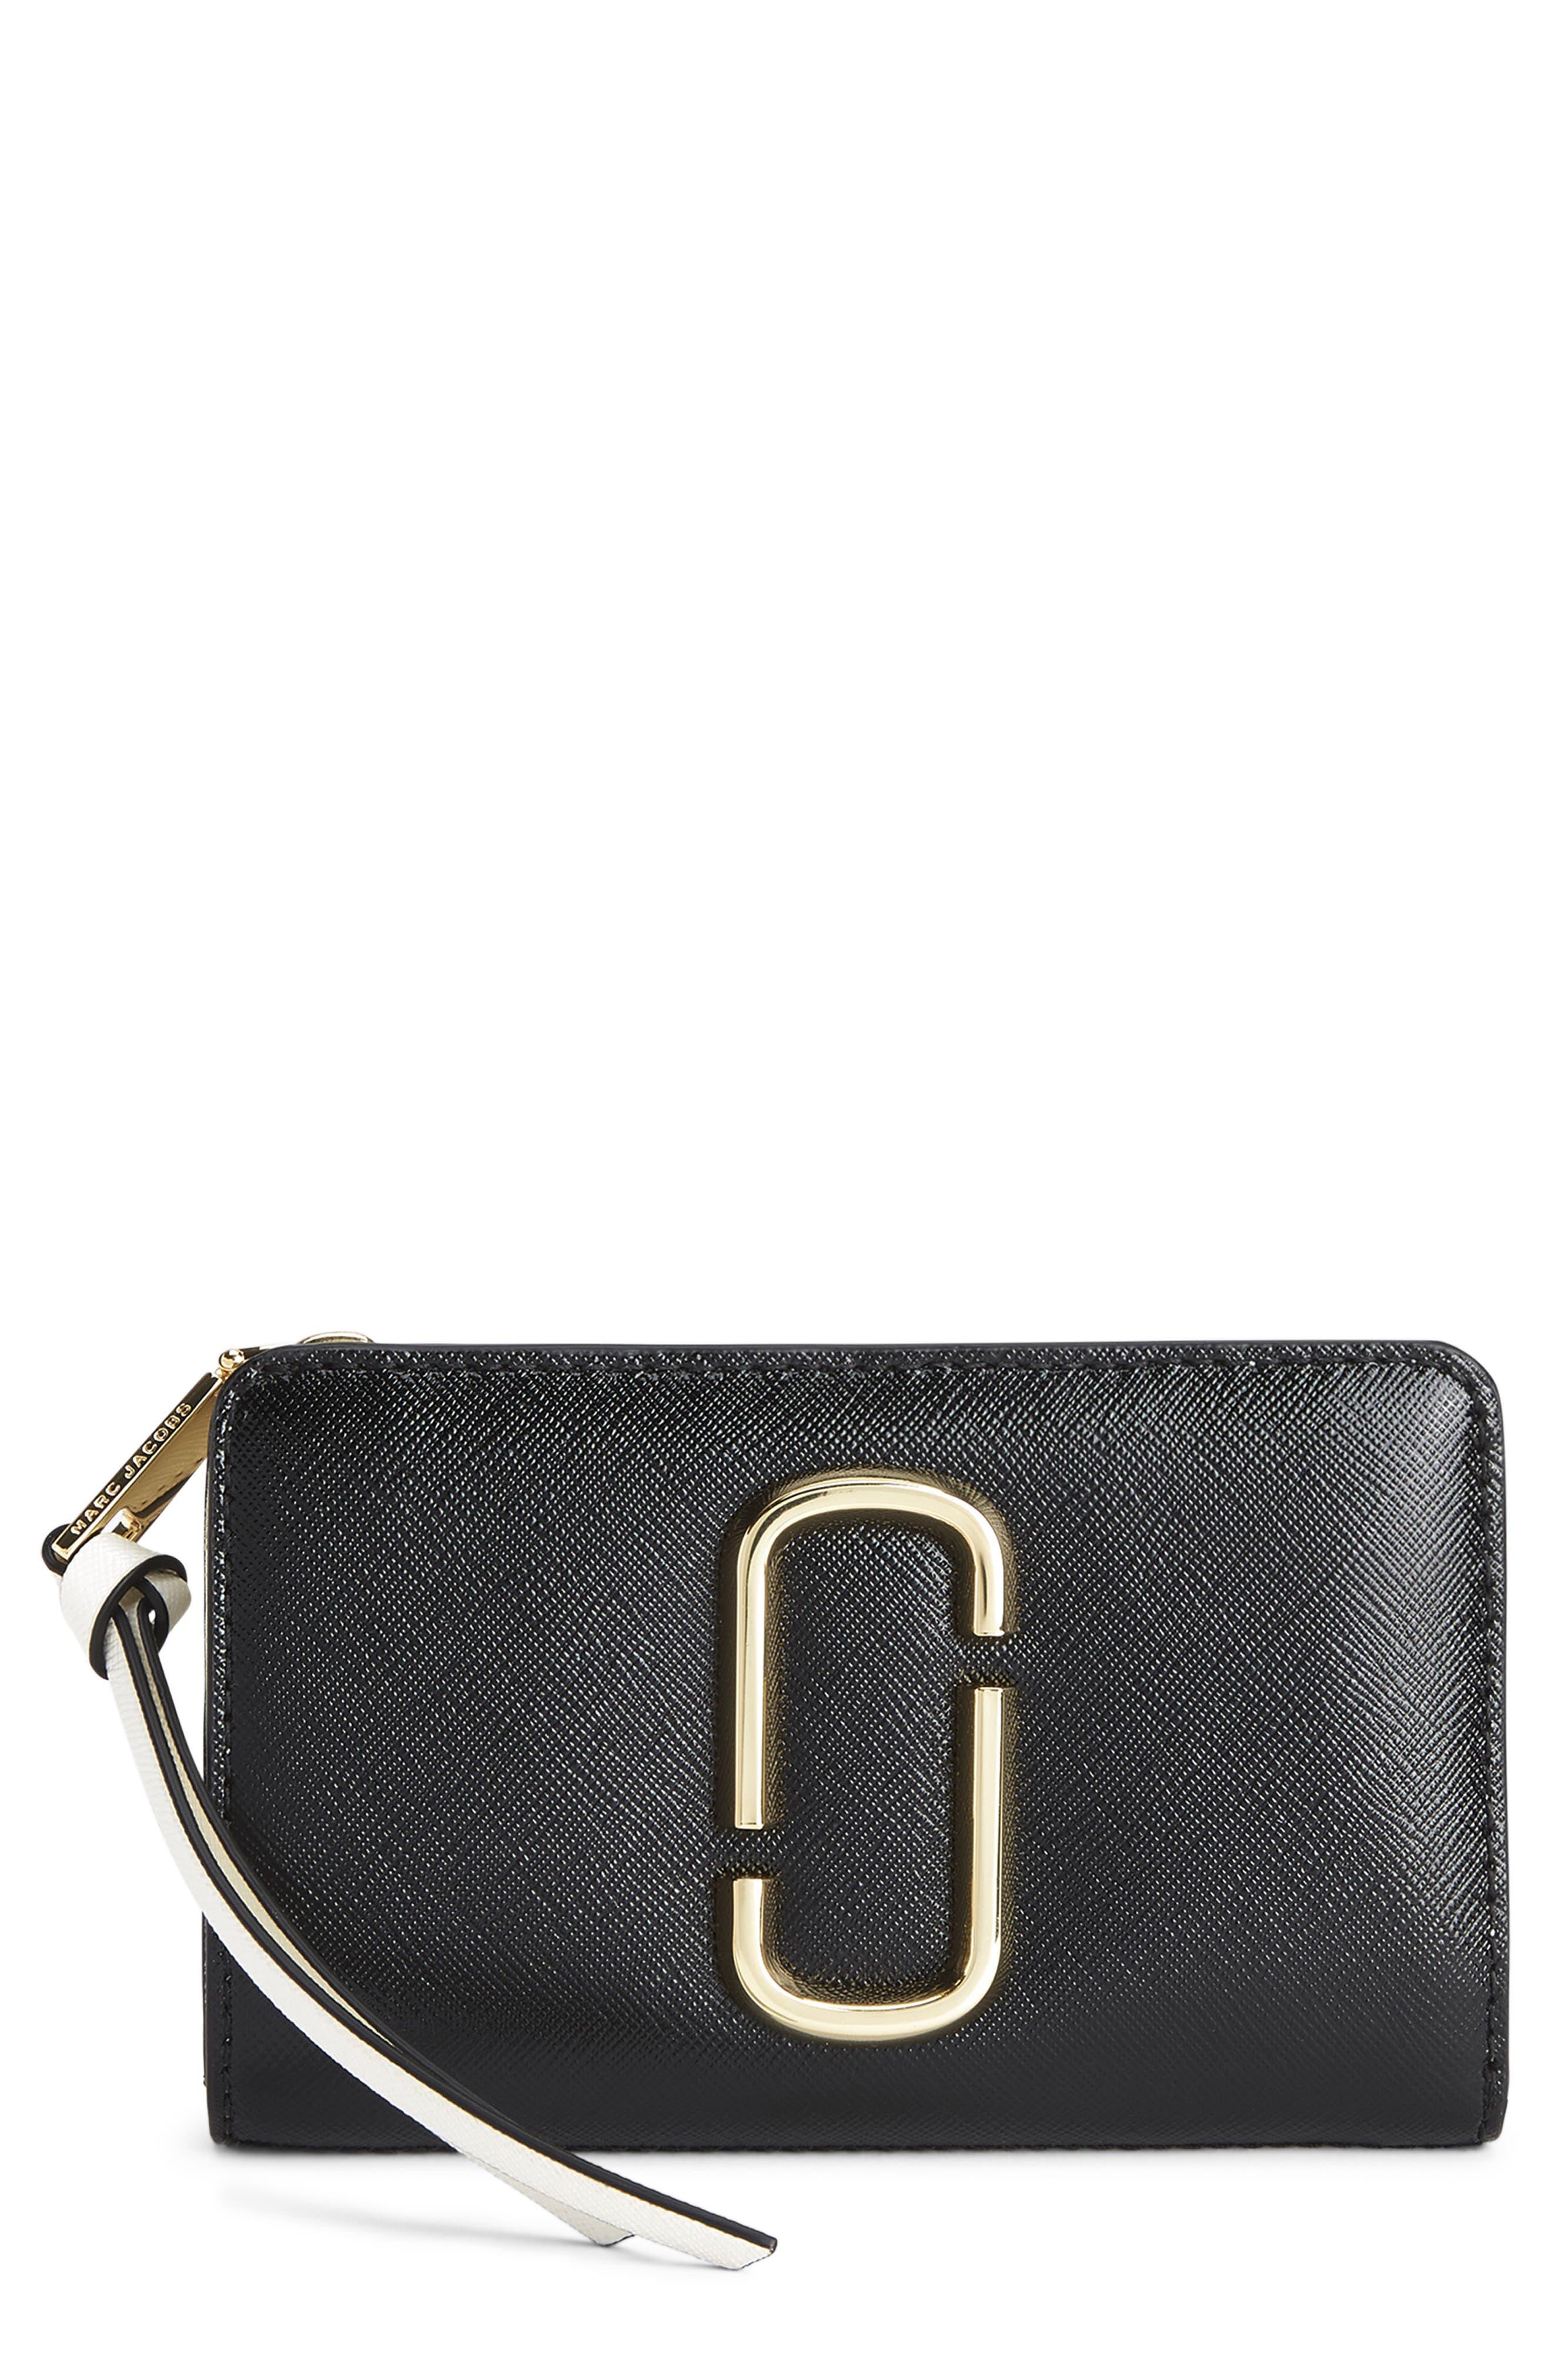 Snapshot Leather Compact Wallet,                             Main thumbnail 1, color,                             BLACK MULTI